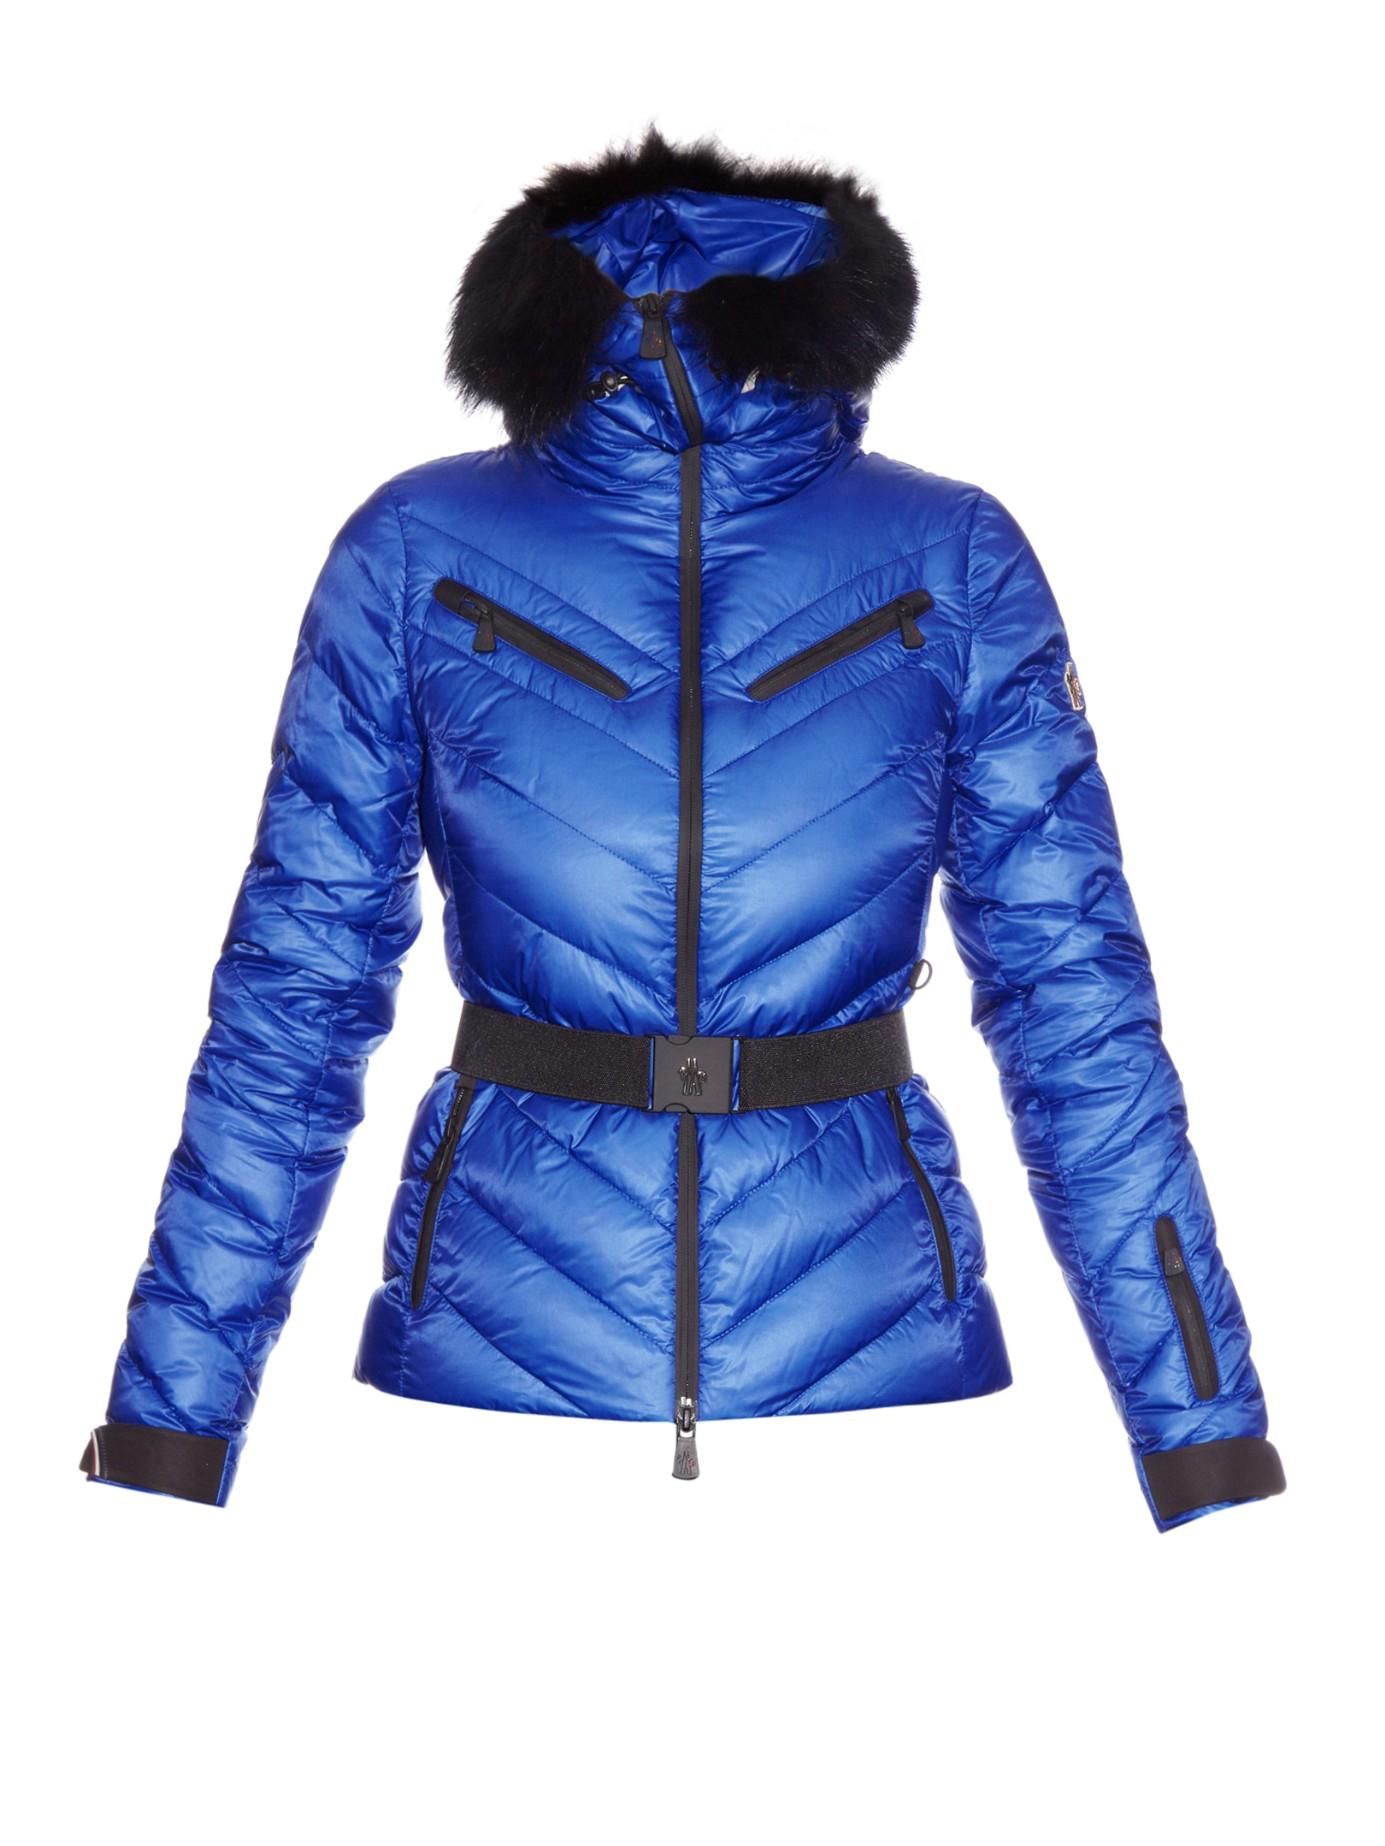 a55b41833 sweden moncler coat womens blue pants 3b01e fa3f9